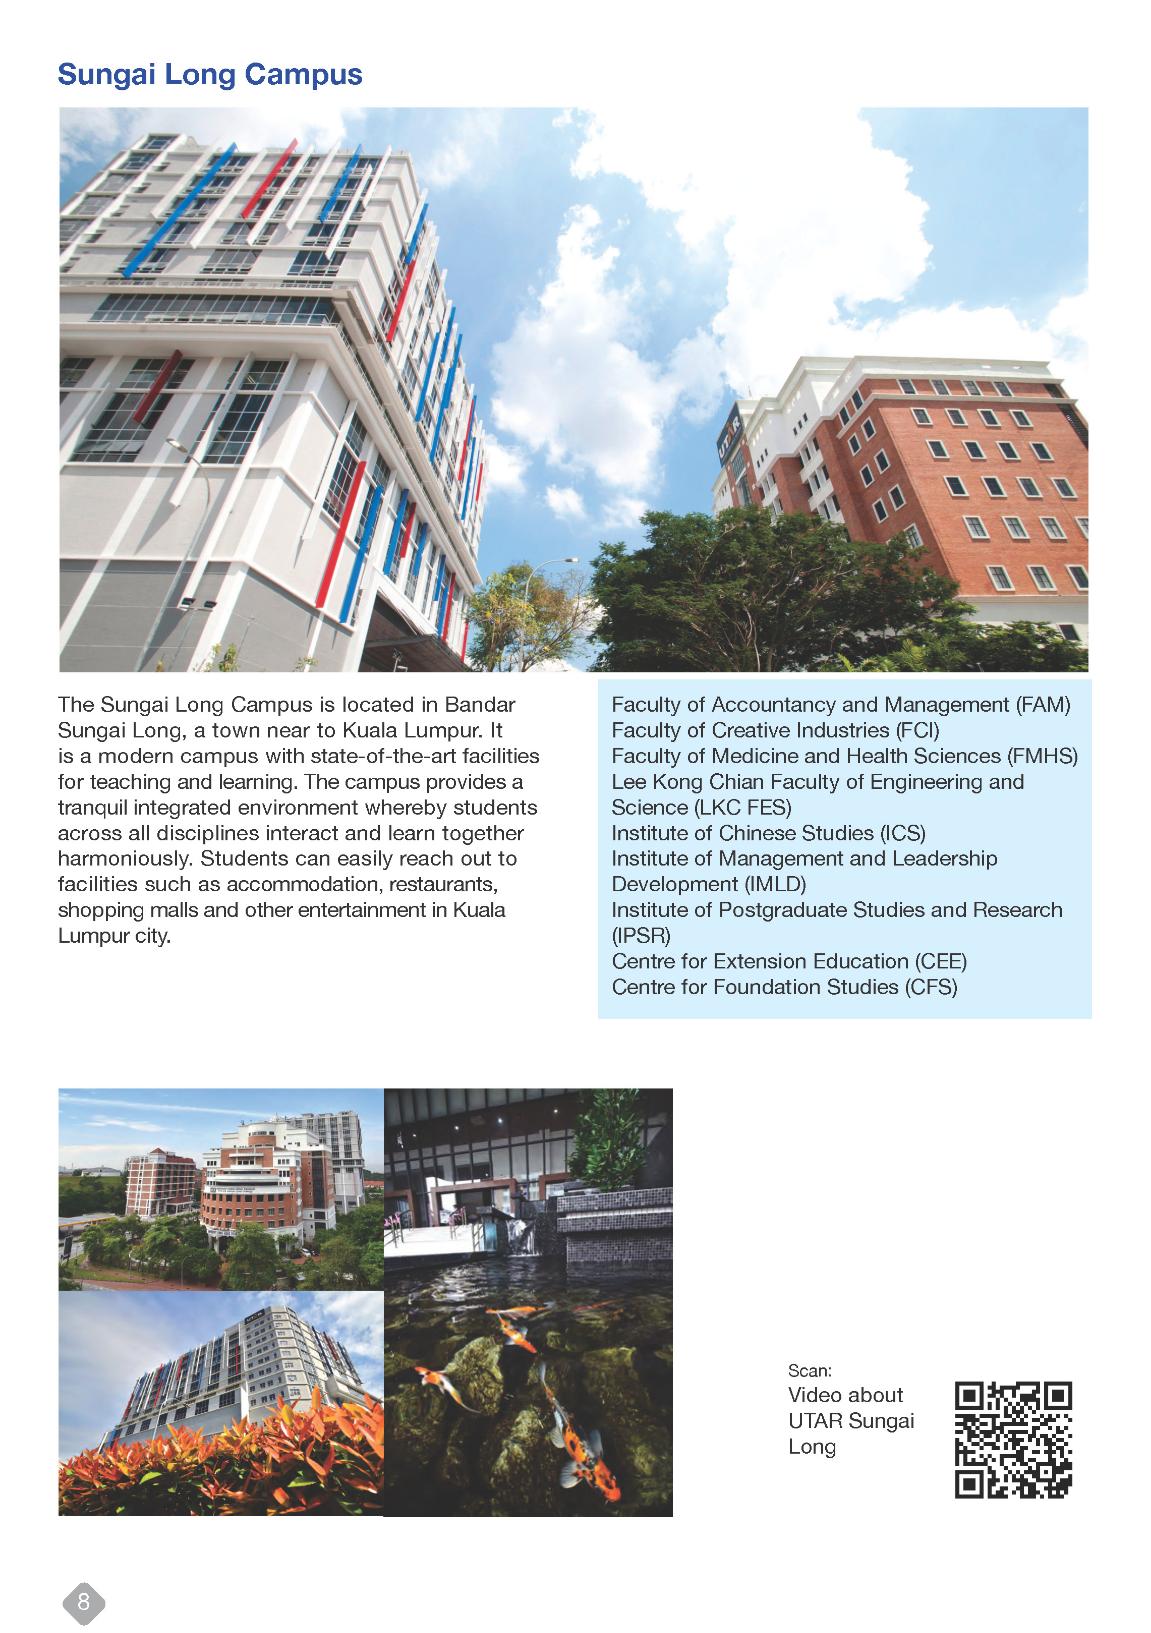 utar-undergraduate-international-university-malaysia